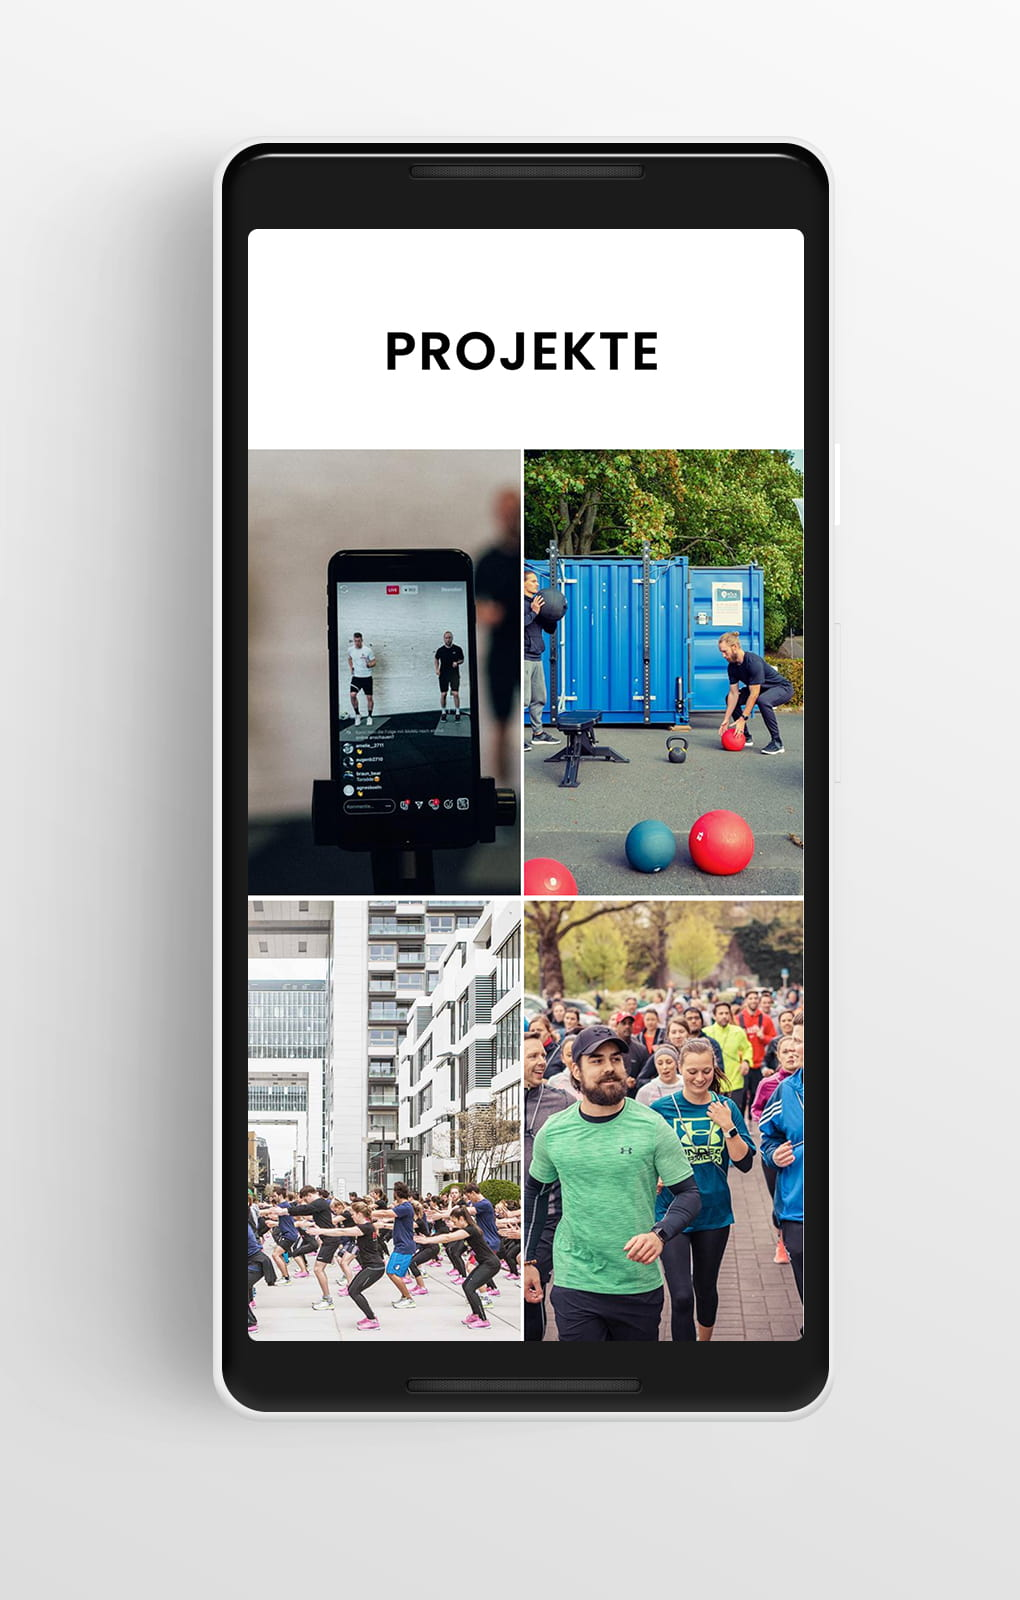 Projekte Mobile - Fit-Köln